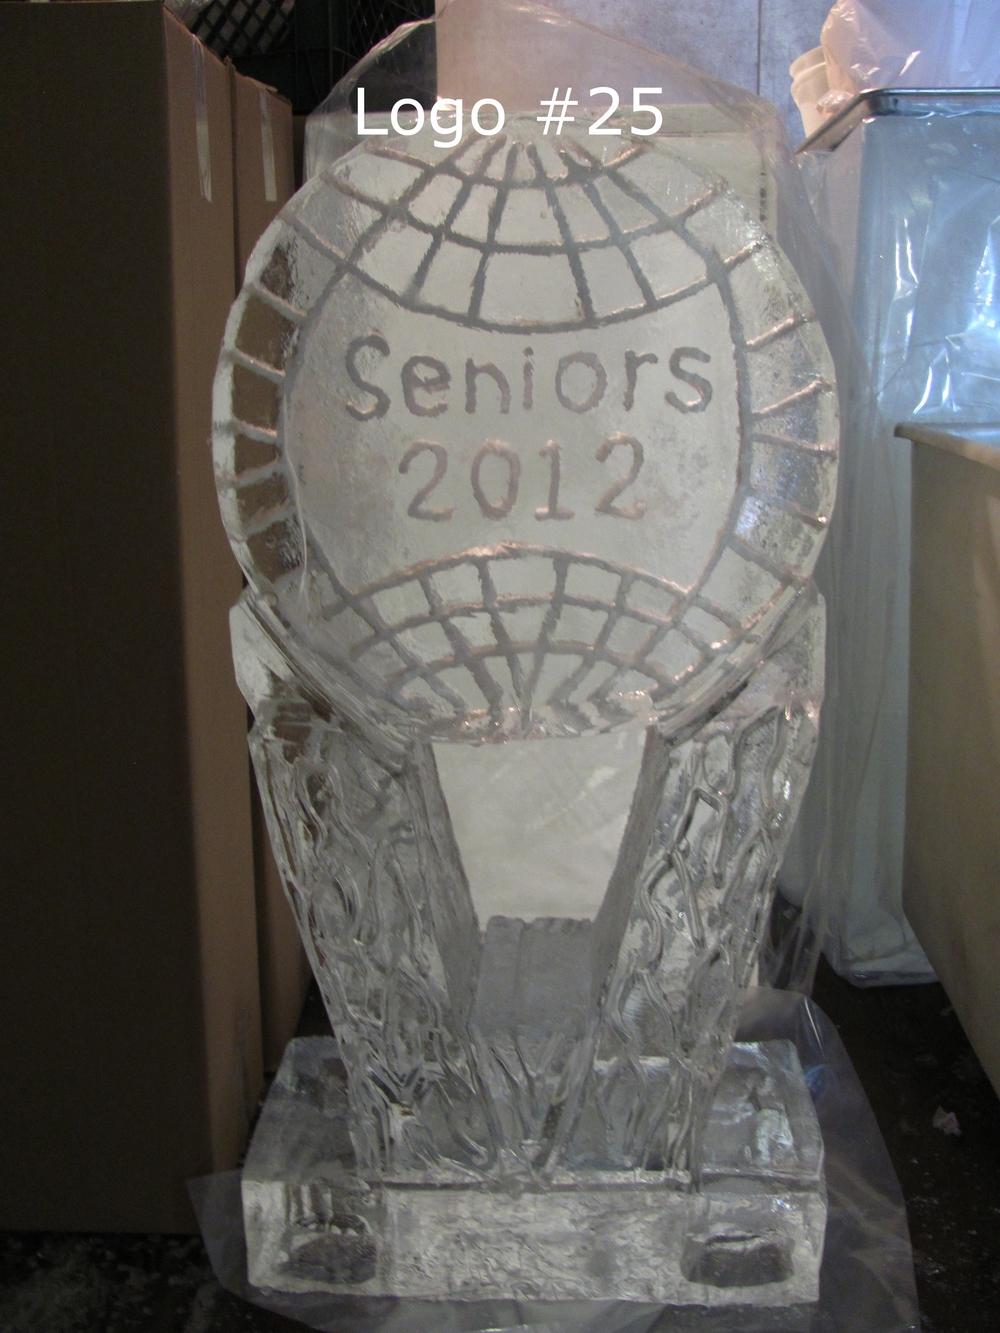 Seniors 2012.jpg